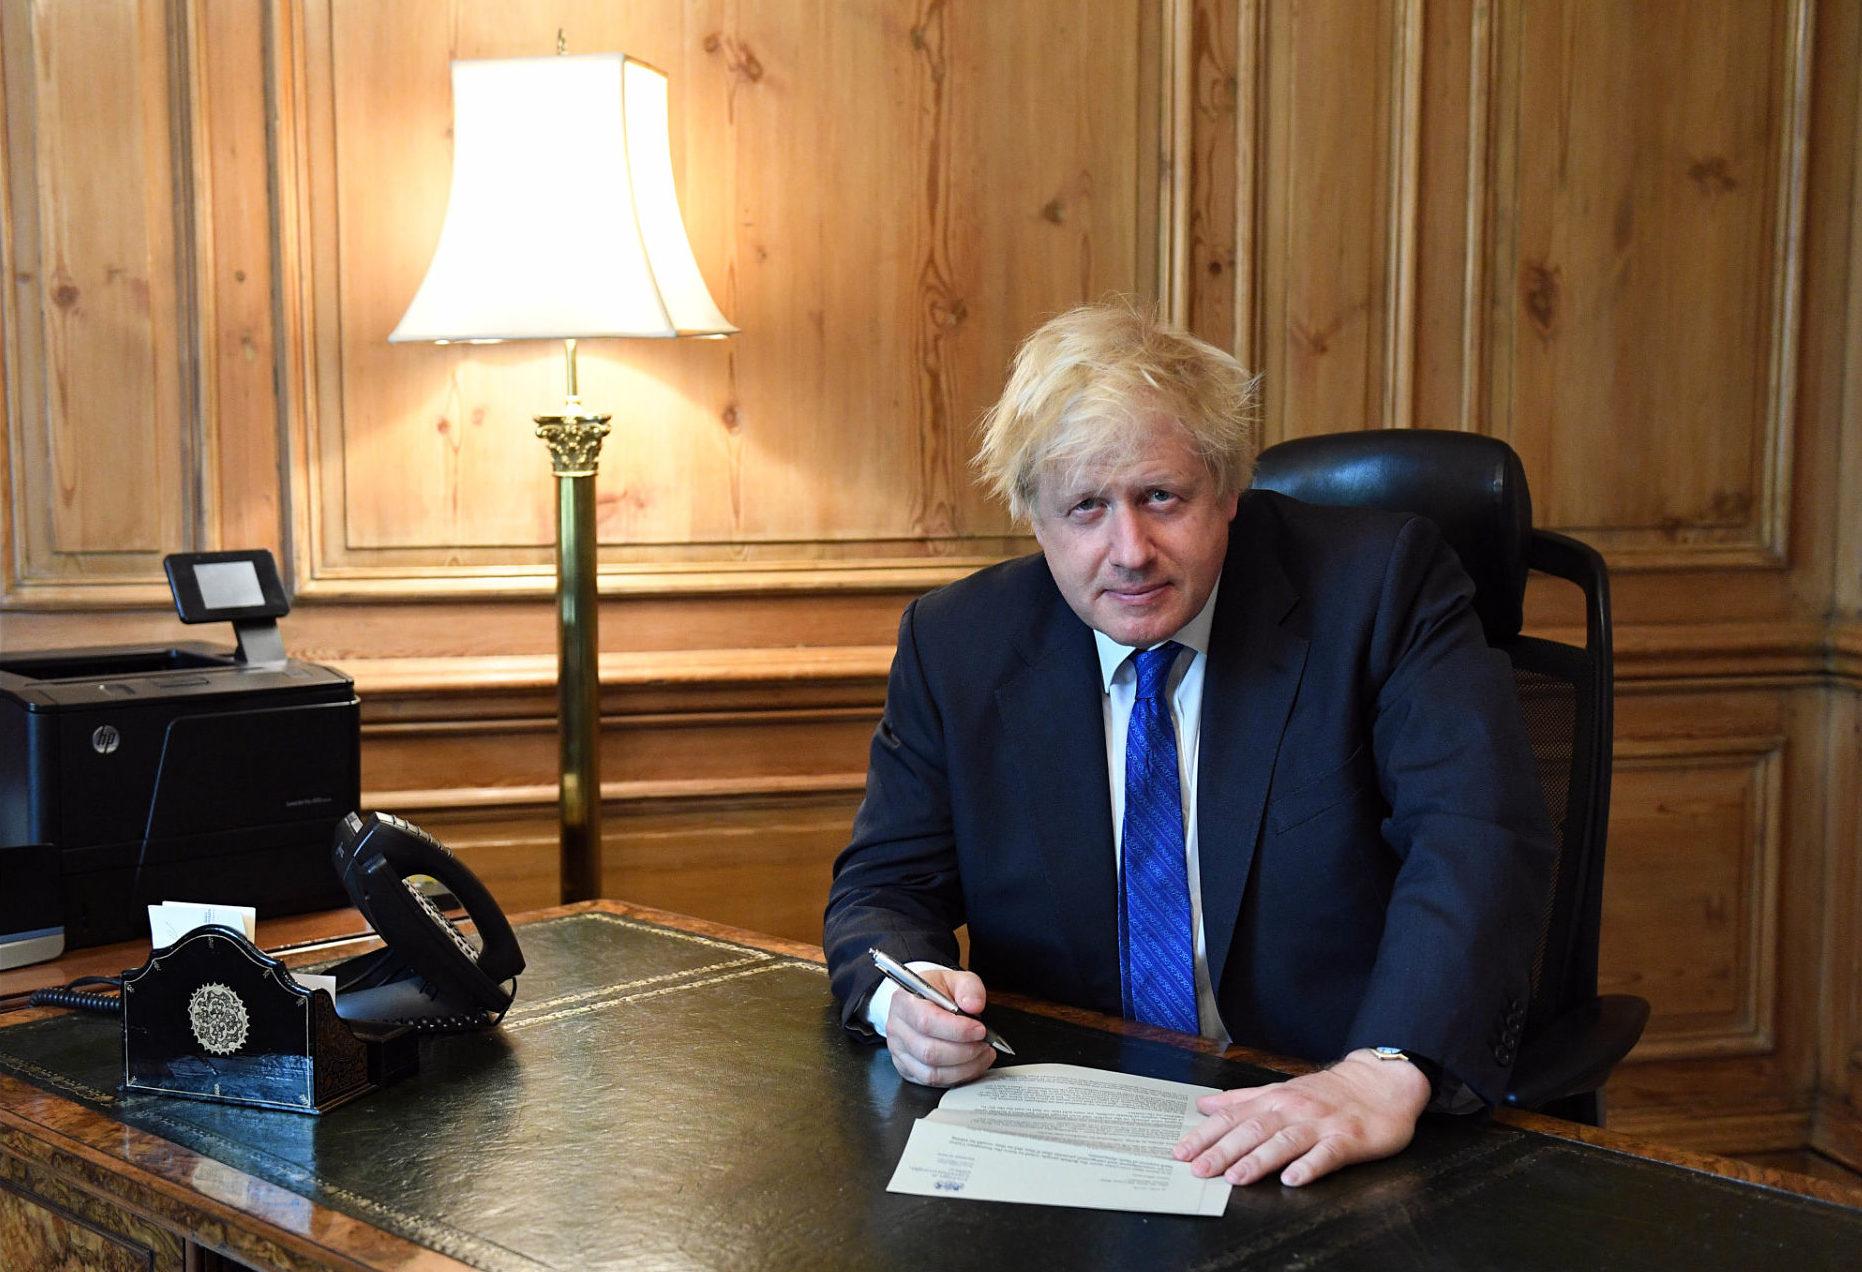 Boris Johnson resigns